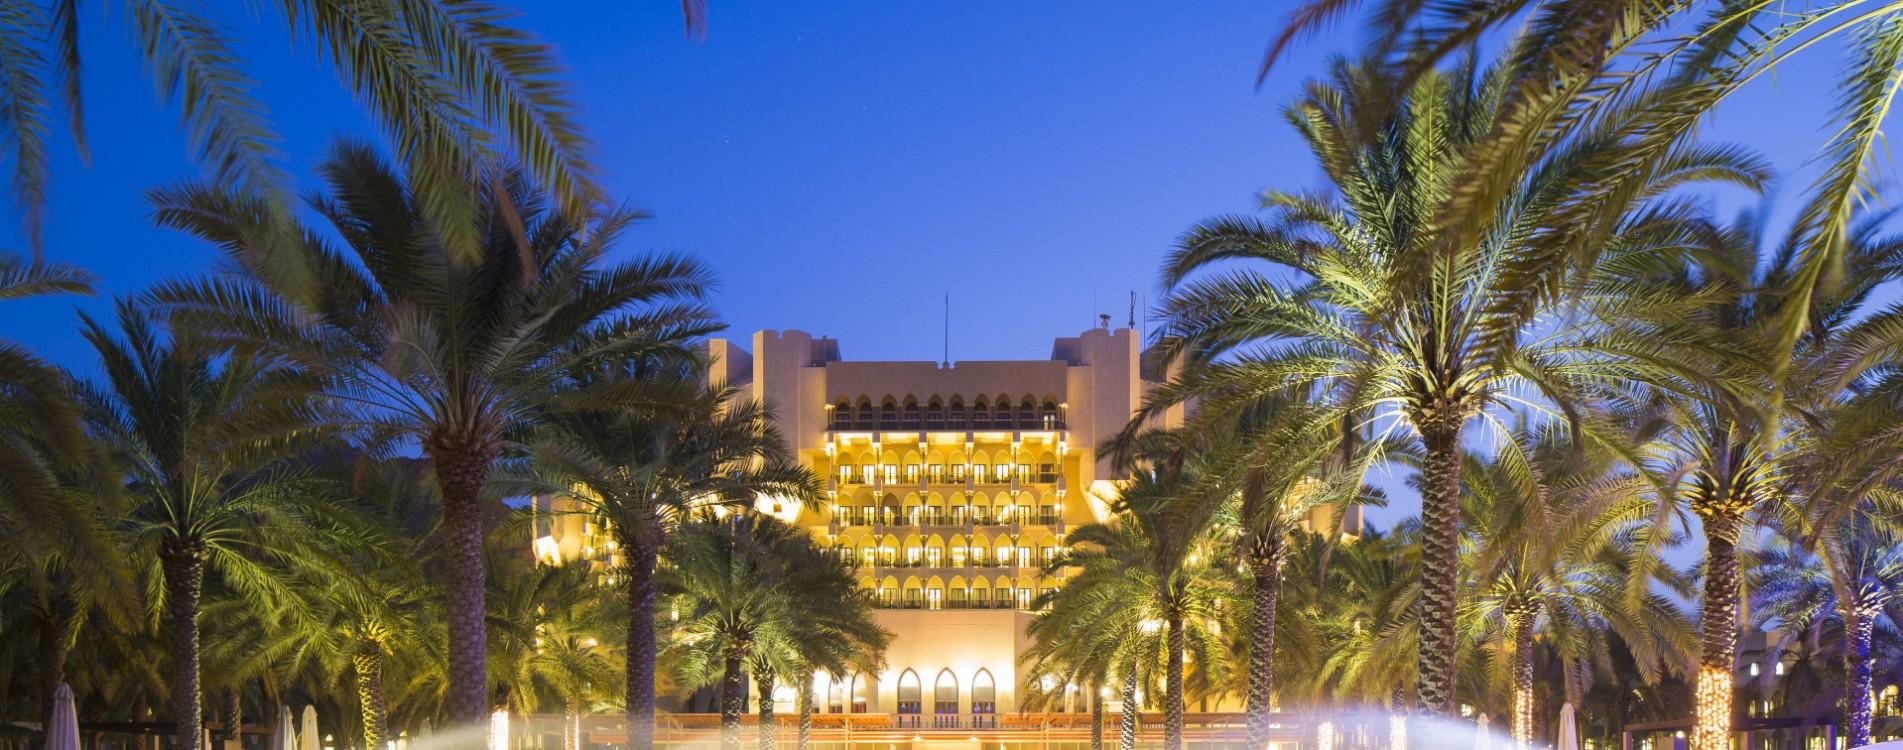 Al-Bustan-Palace-Muskat-Infinity-Pool-Exterior-Nacht-Oman.jpg